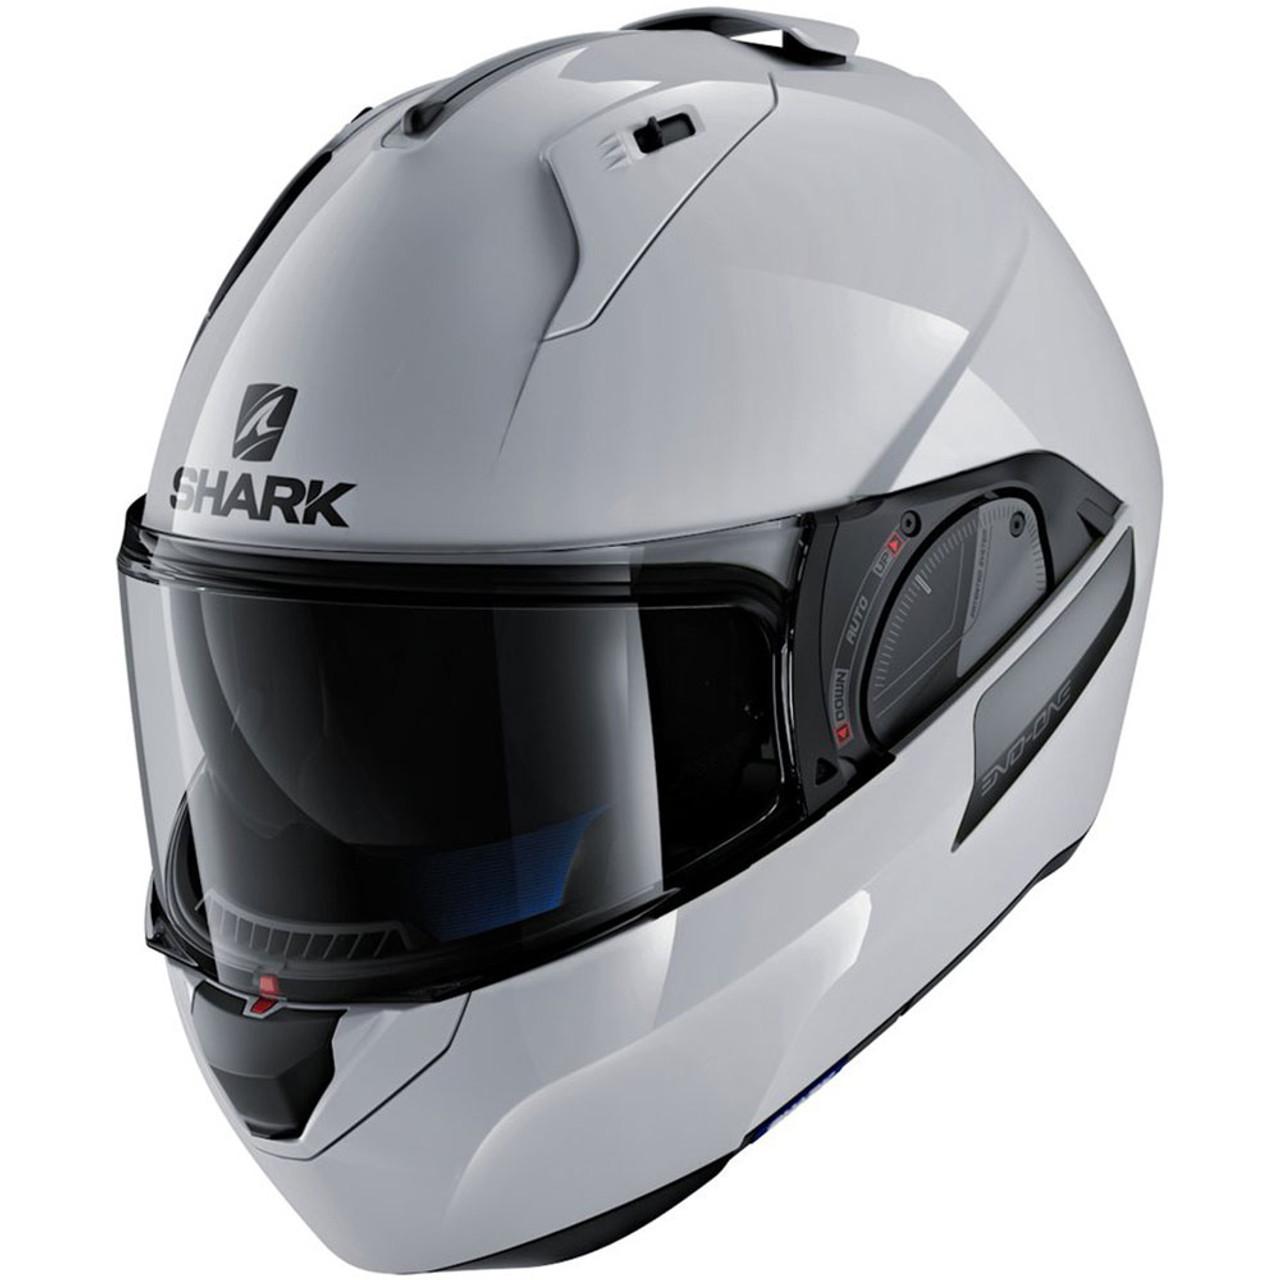 shark evo one 2 modular helmet gloss white he9700dwhum get lowered cycles. Black Bedroom Furniture Sets. Home Design Ideas